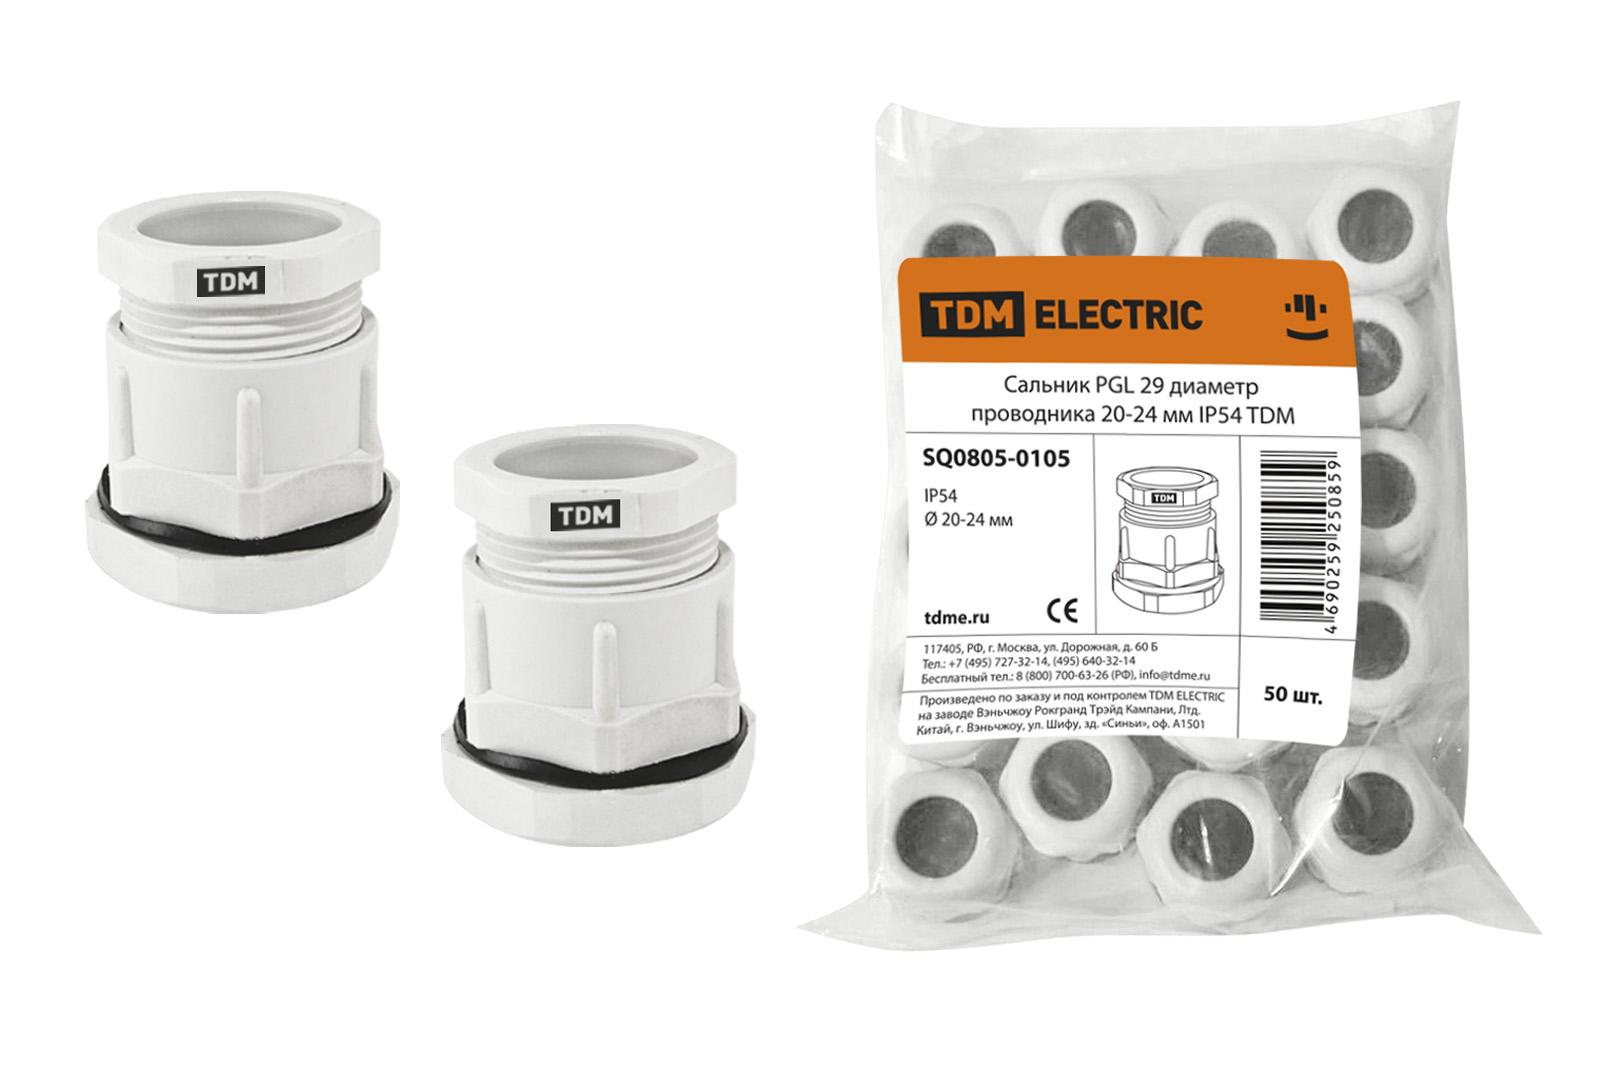 Сальник PGL 29 диаметр проводника 20-24 мм IP54 TDM SQ0805-0105 TDM Electric